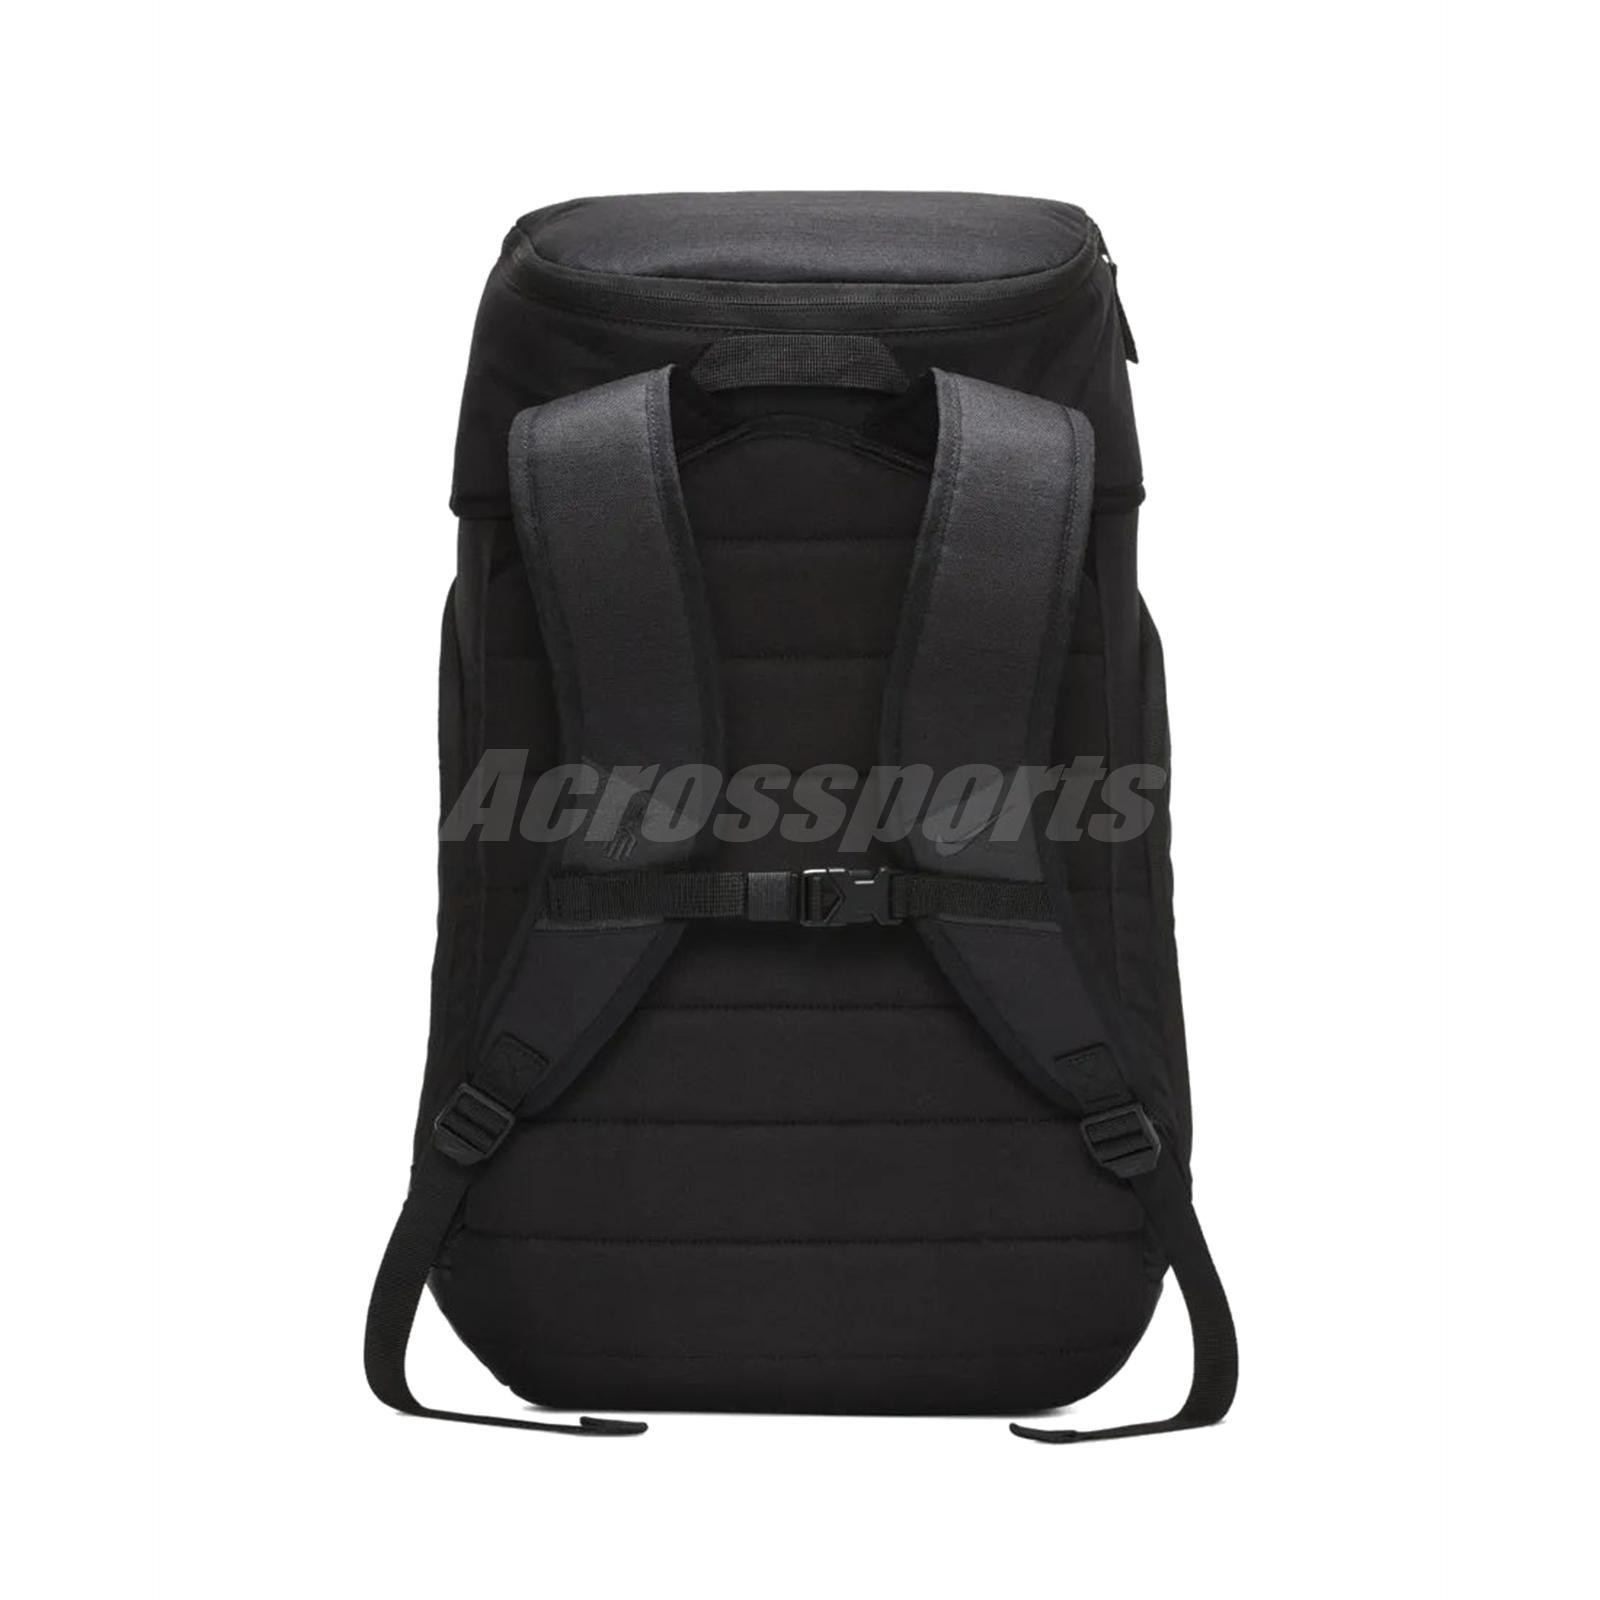 c1dc25235ca1 Nike Kyrie Irving Backpack Bookbag Daypack Black Basketball Bag 37L ...